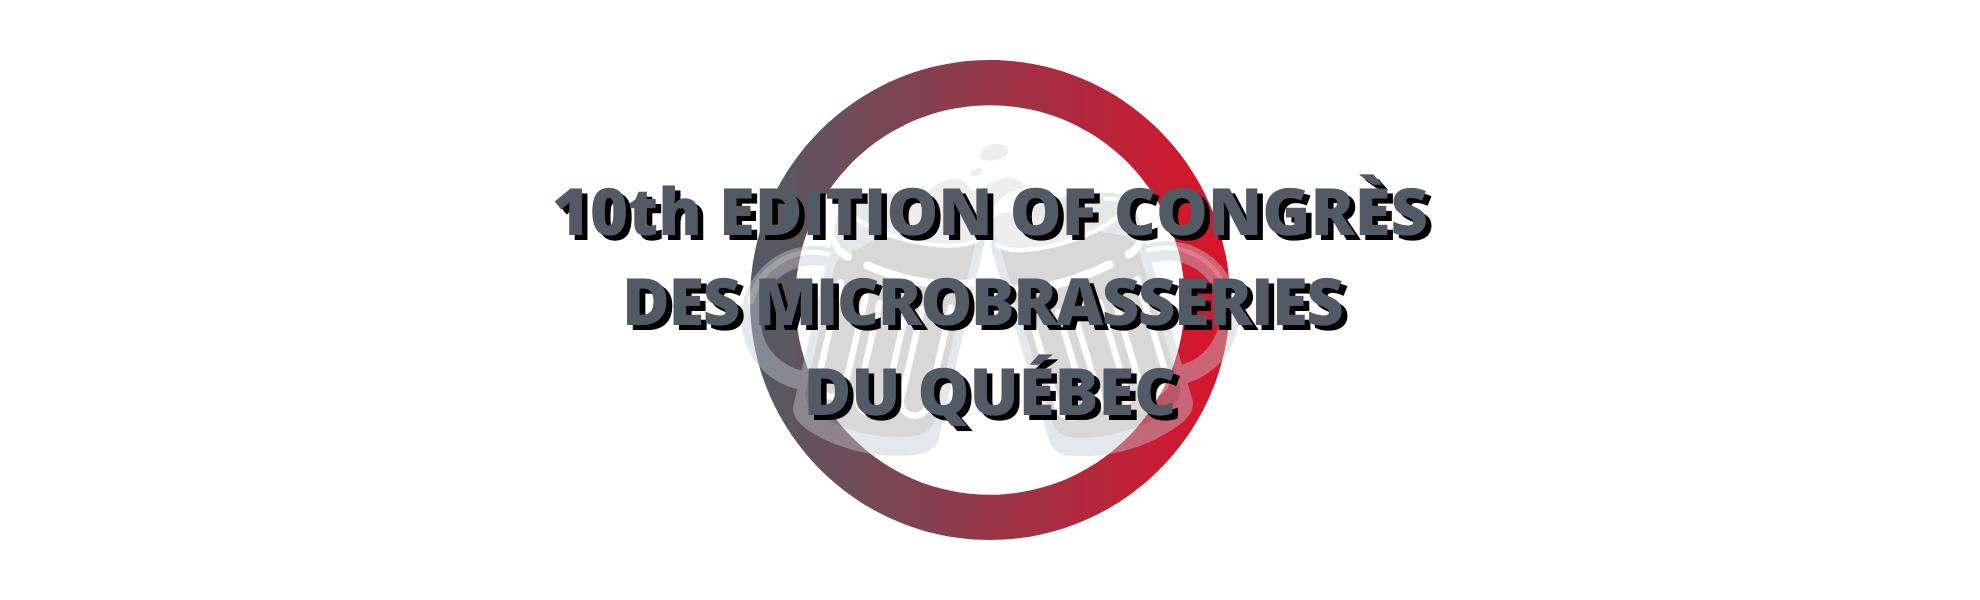 10TH EDITION OF THE CONGRÈS DES MICROBRASSERIES DU QUÉBEC